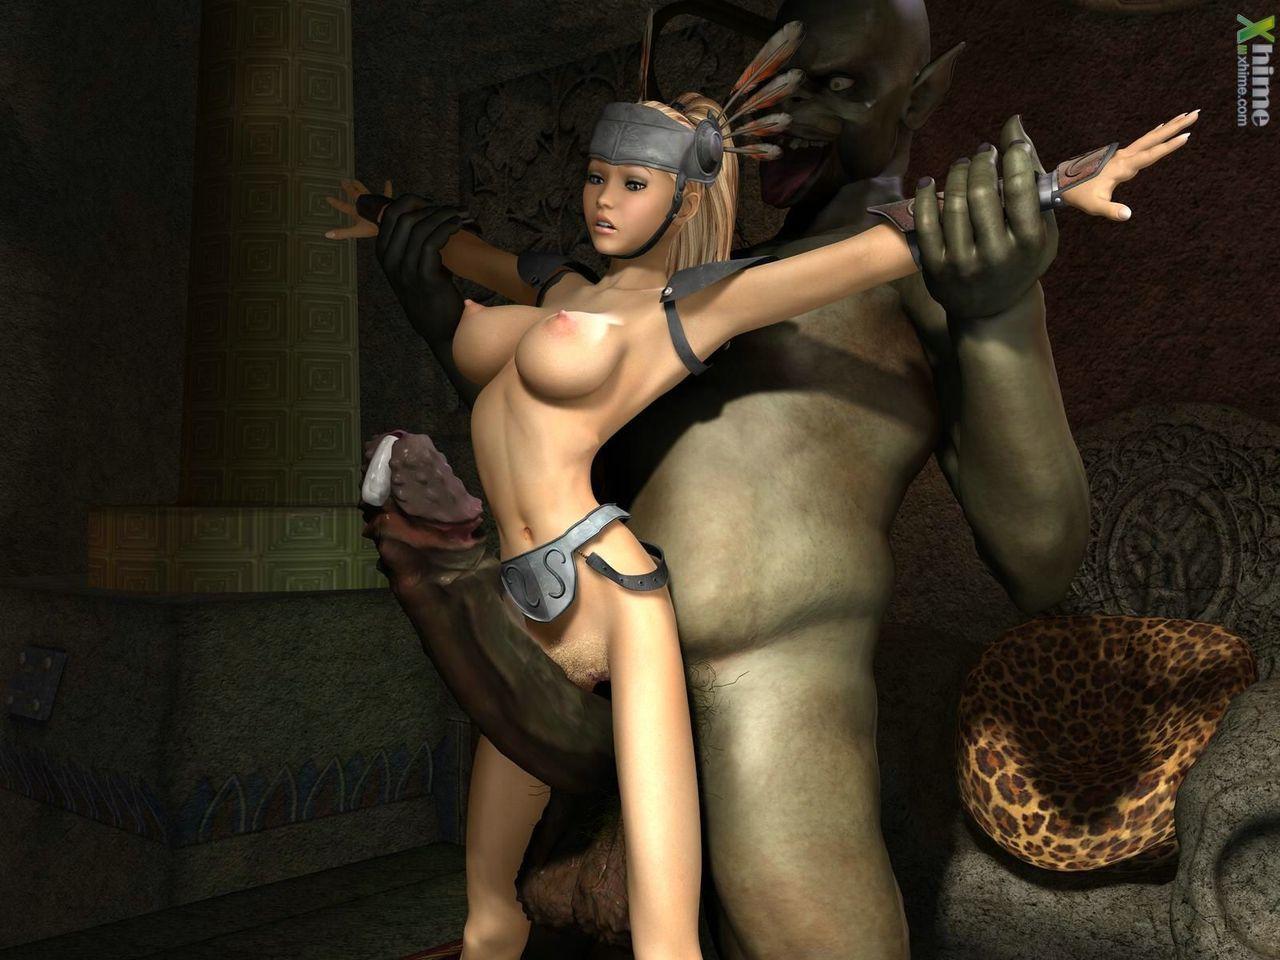 fantasy cg collection - part 6